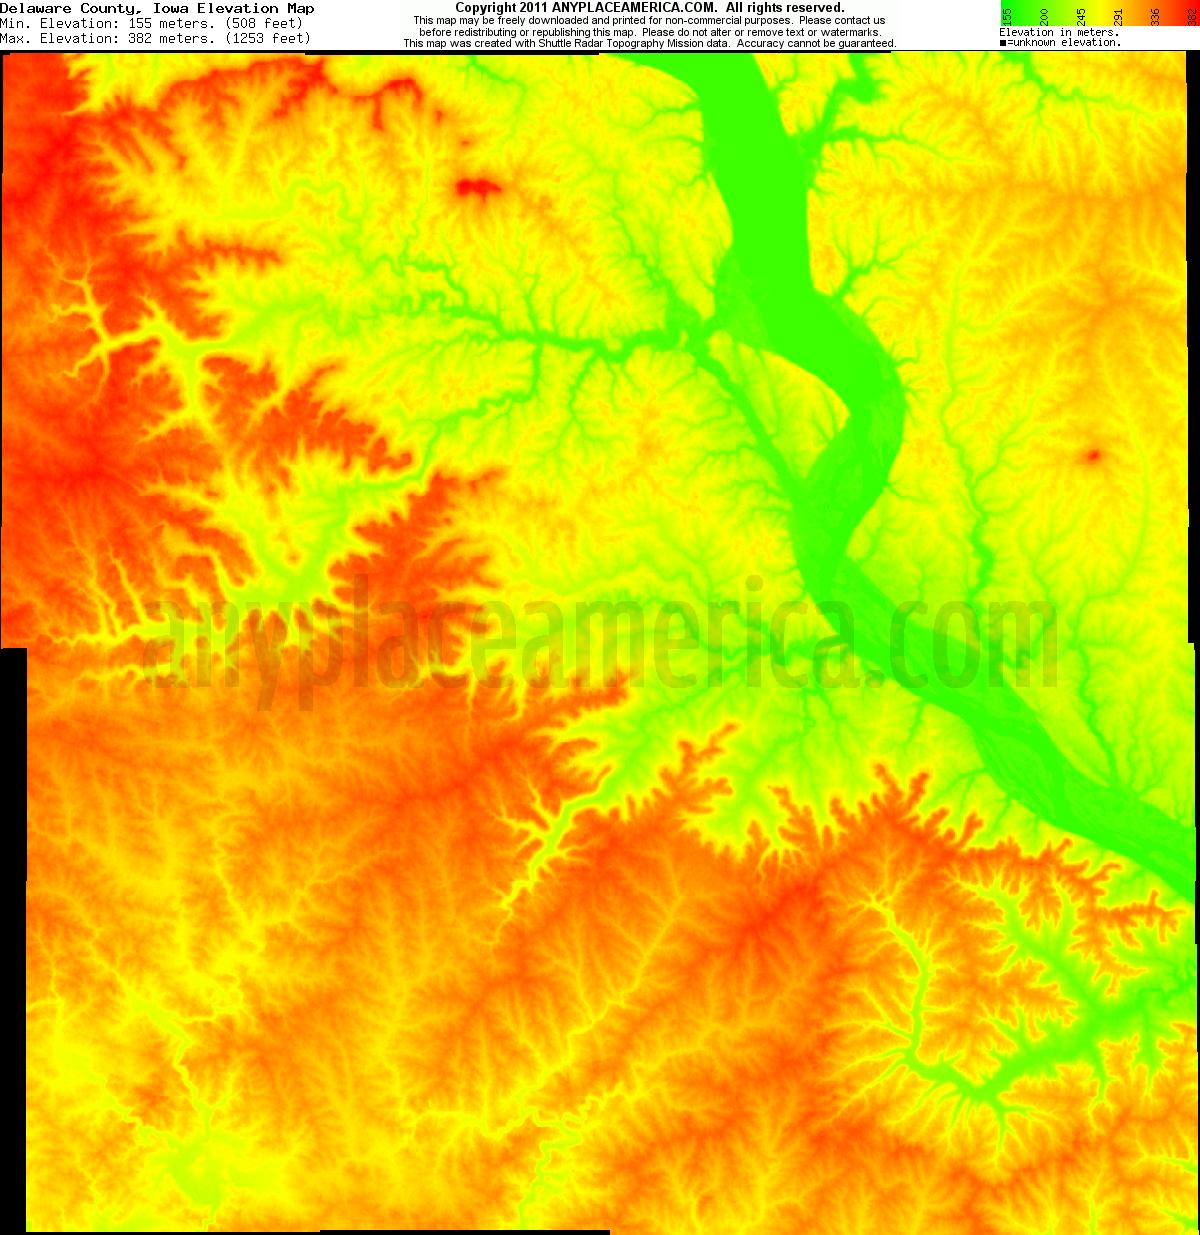 free delaware county iowa topo maps elevations free delaware county iowa topo maps